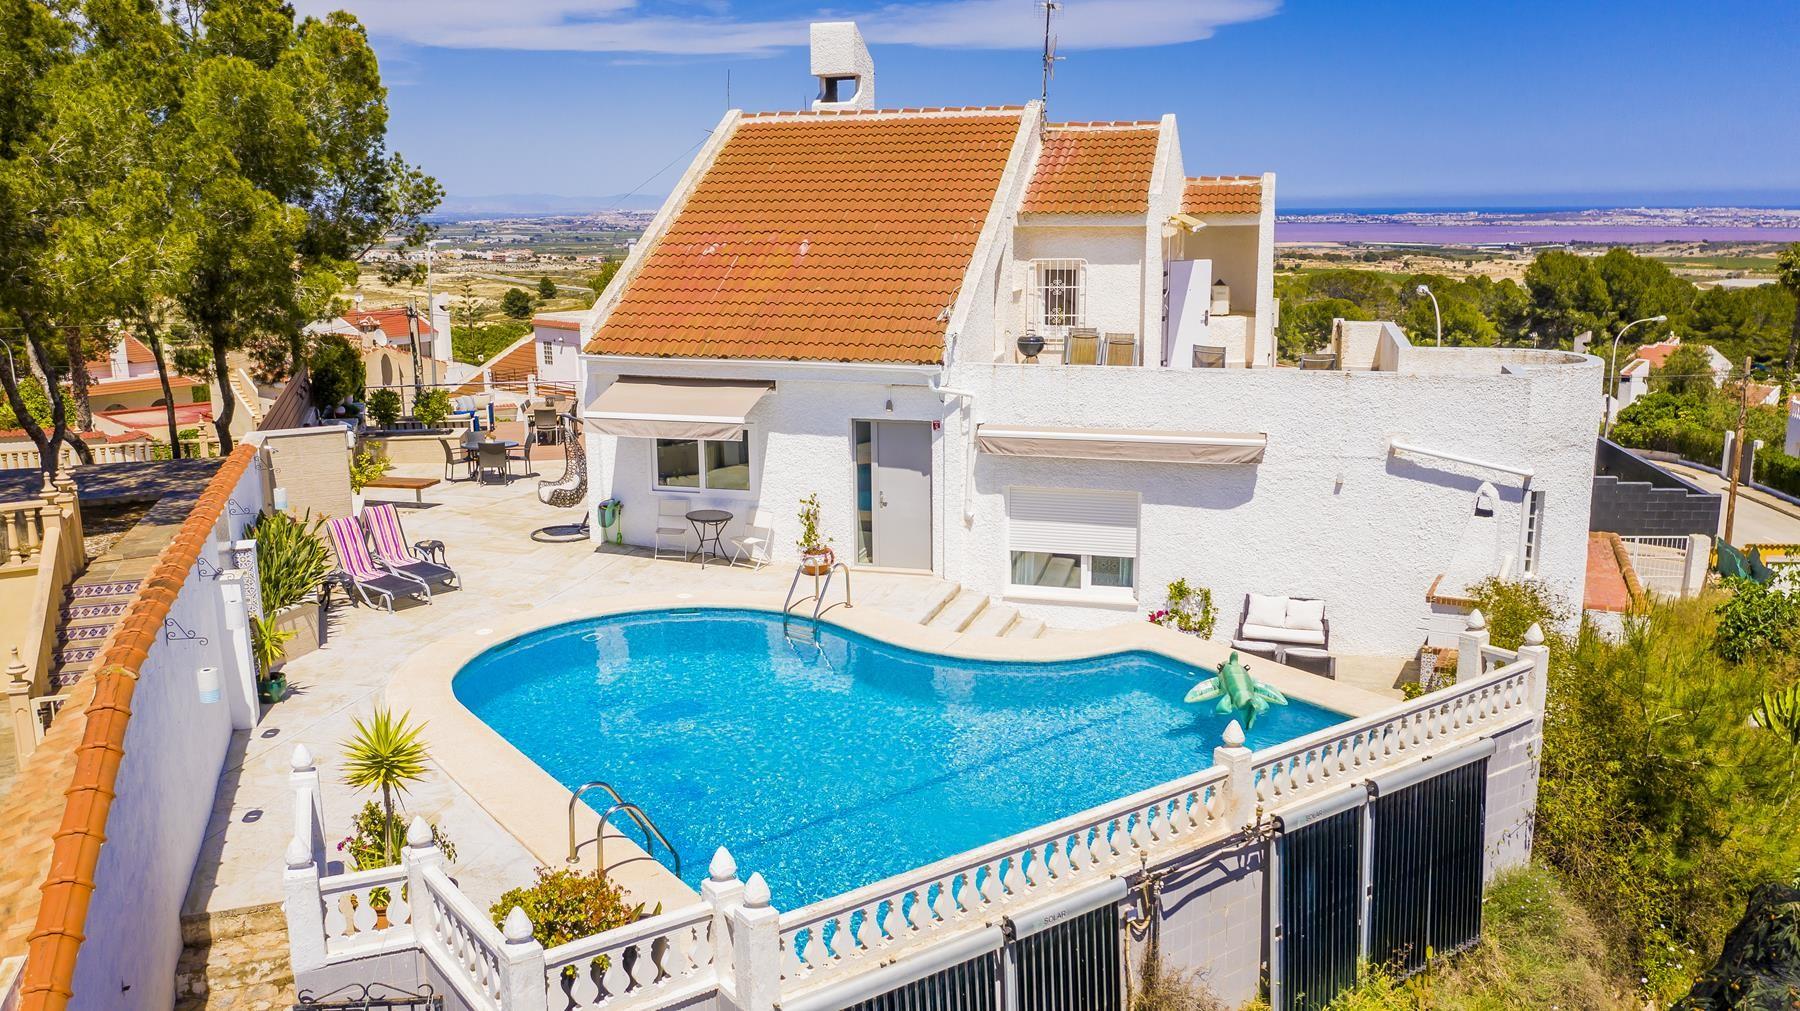 Las comunicaciones, fantastic renovated 5-bedroom villa